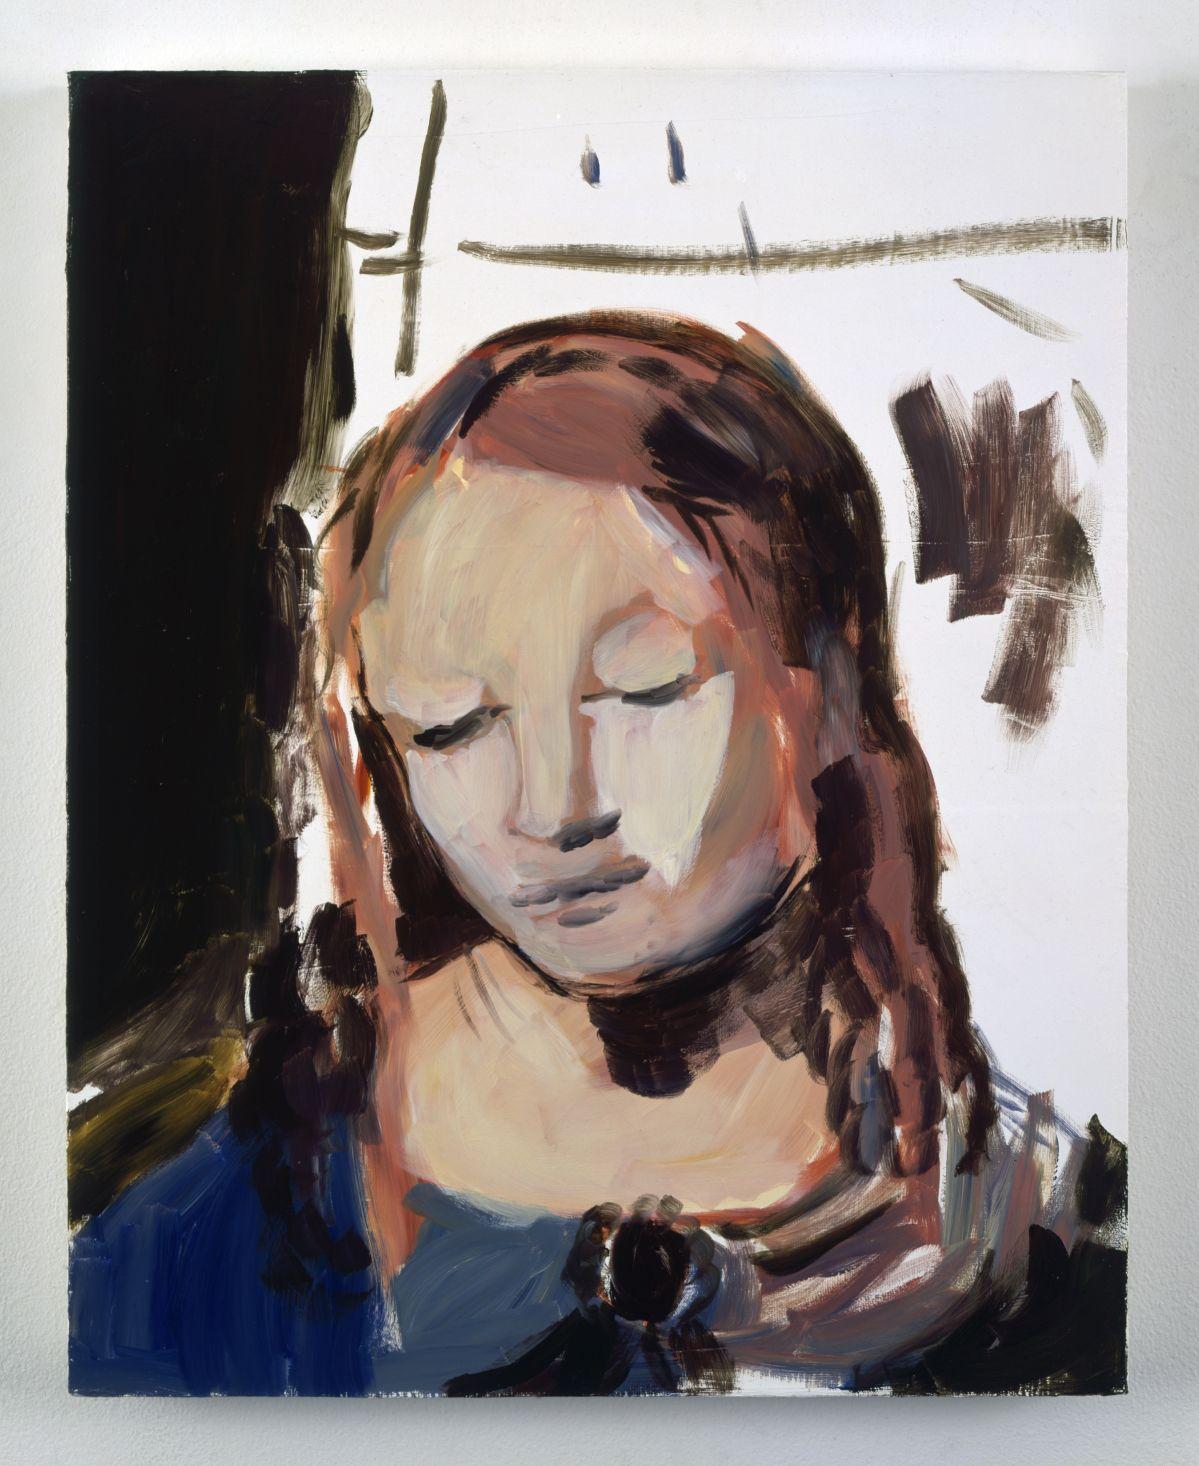 Karen Kilimnik - The angel of the Plague, 2005 - 00s. Collection Cranford - les années 2000 au MO.CO. Montpellier Huile hydrosoluble sur toile. 50,8 x 40,6 cm. © Karen Kilimnik, courtesy 303 Gallery, New York